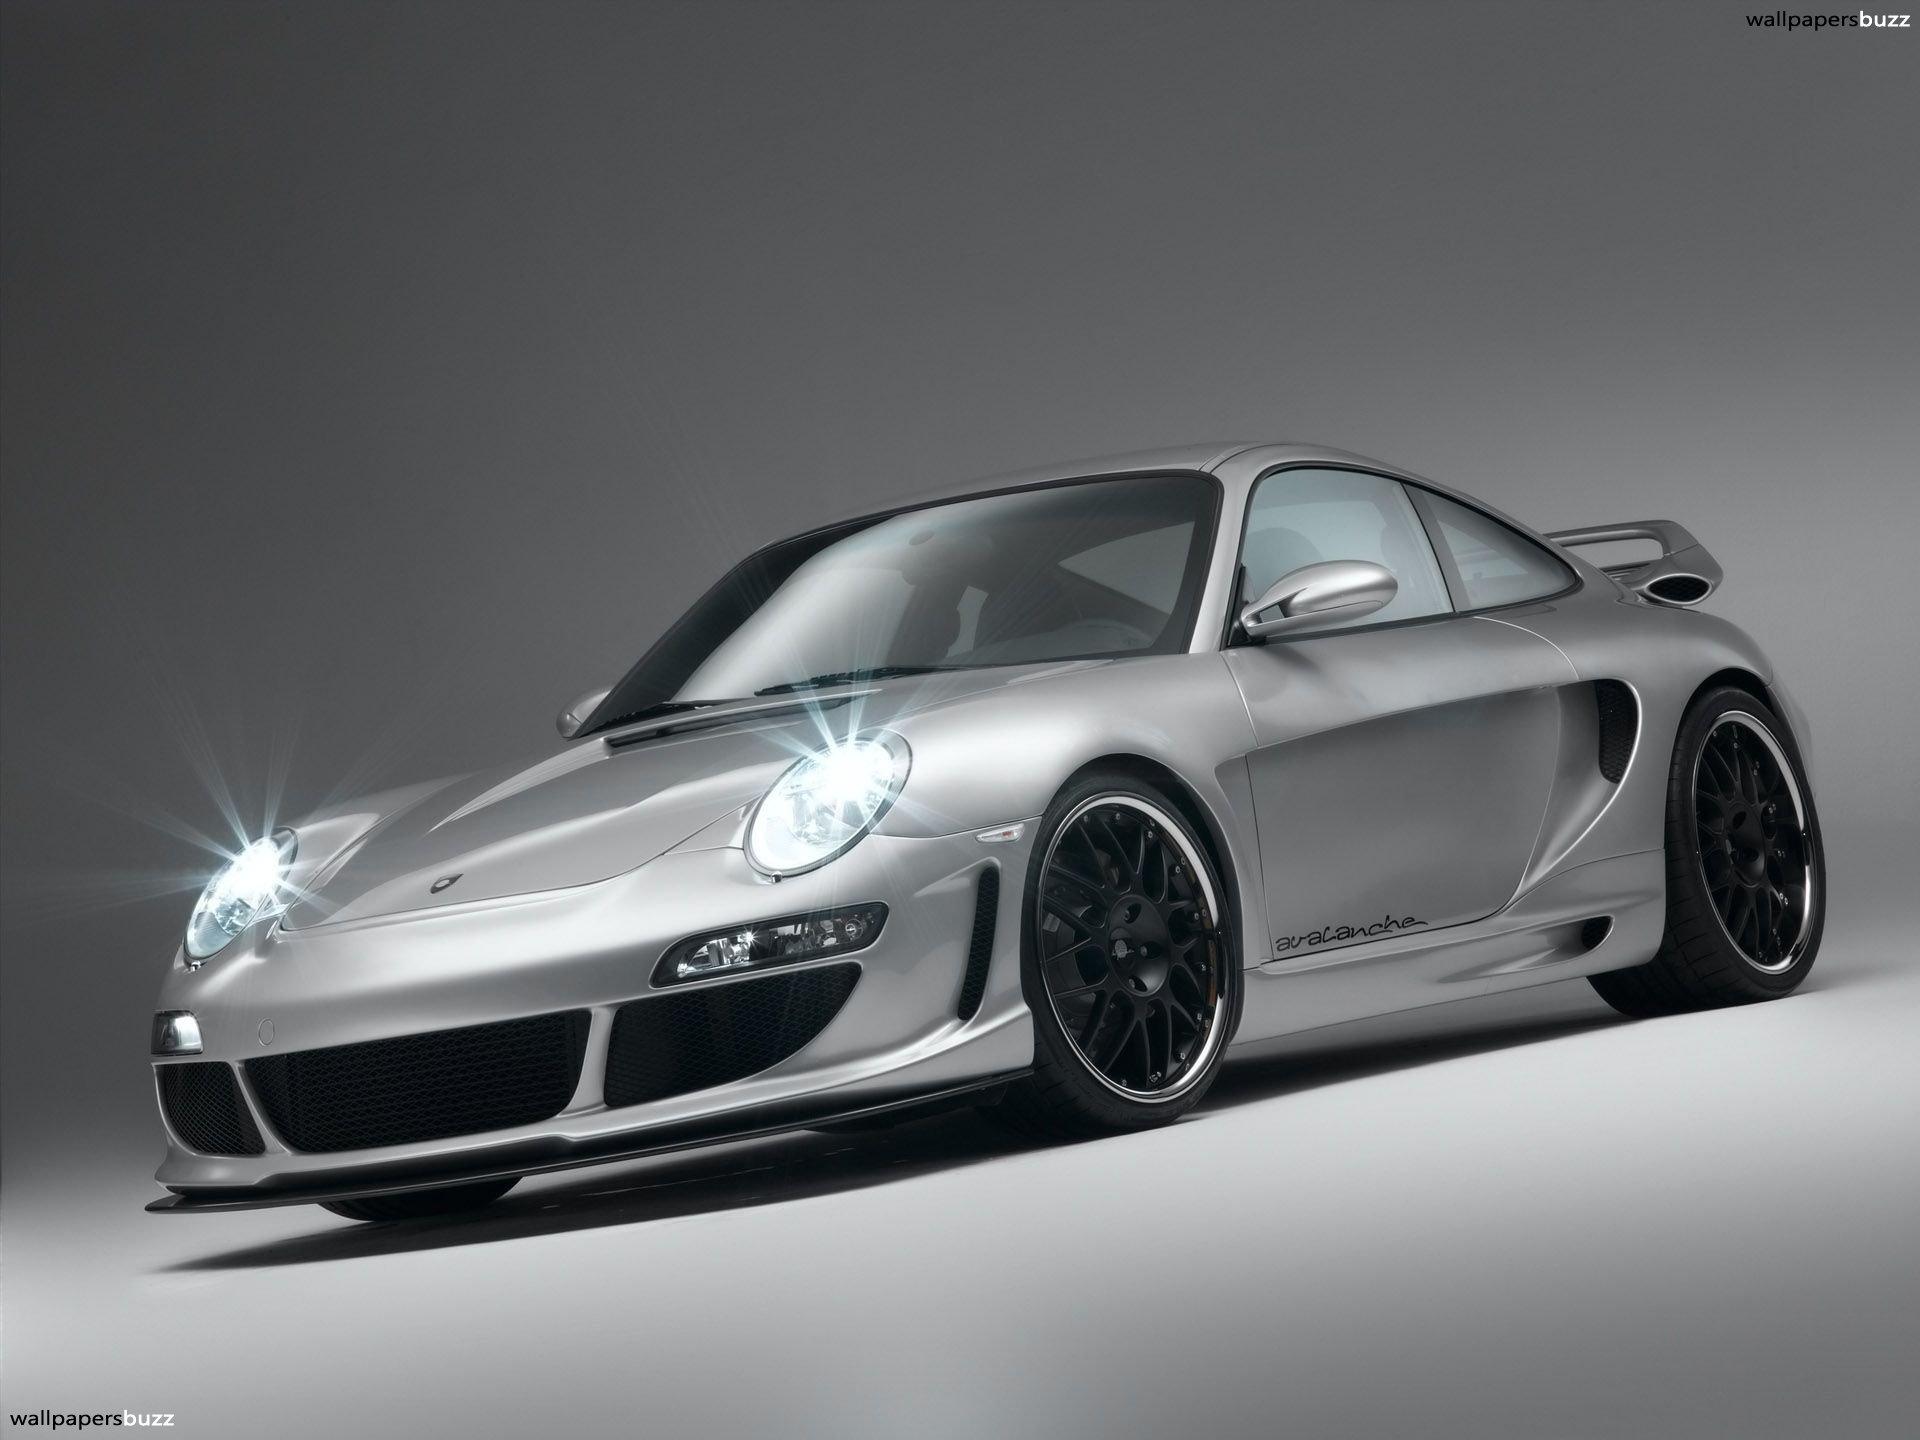 Porsche Car Ments For Gray With Lights Hd 188592 Wallpaper wallpaper